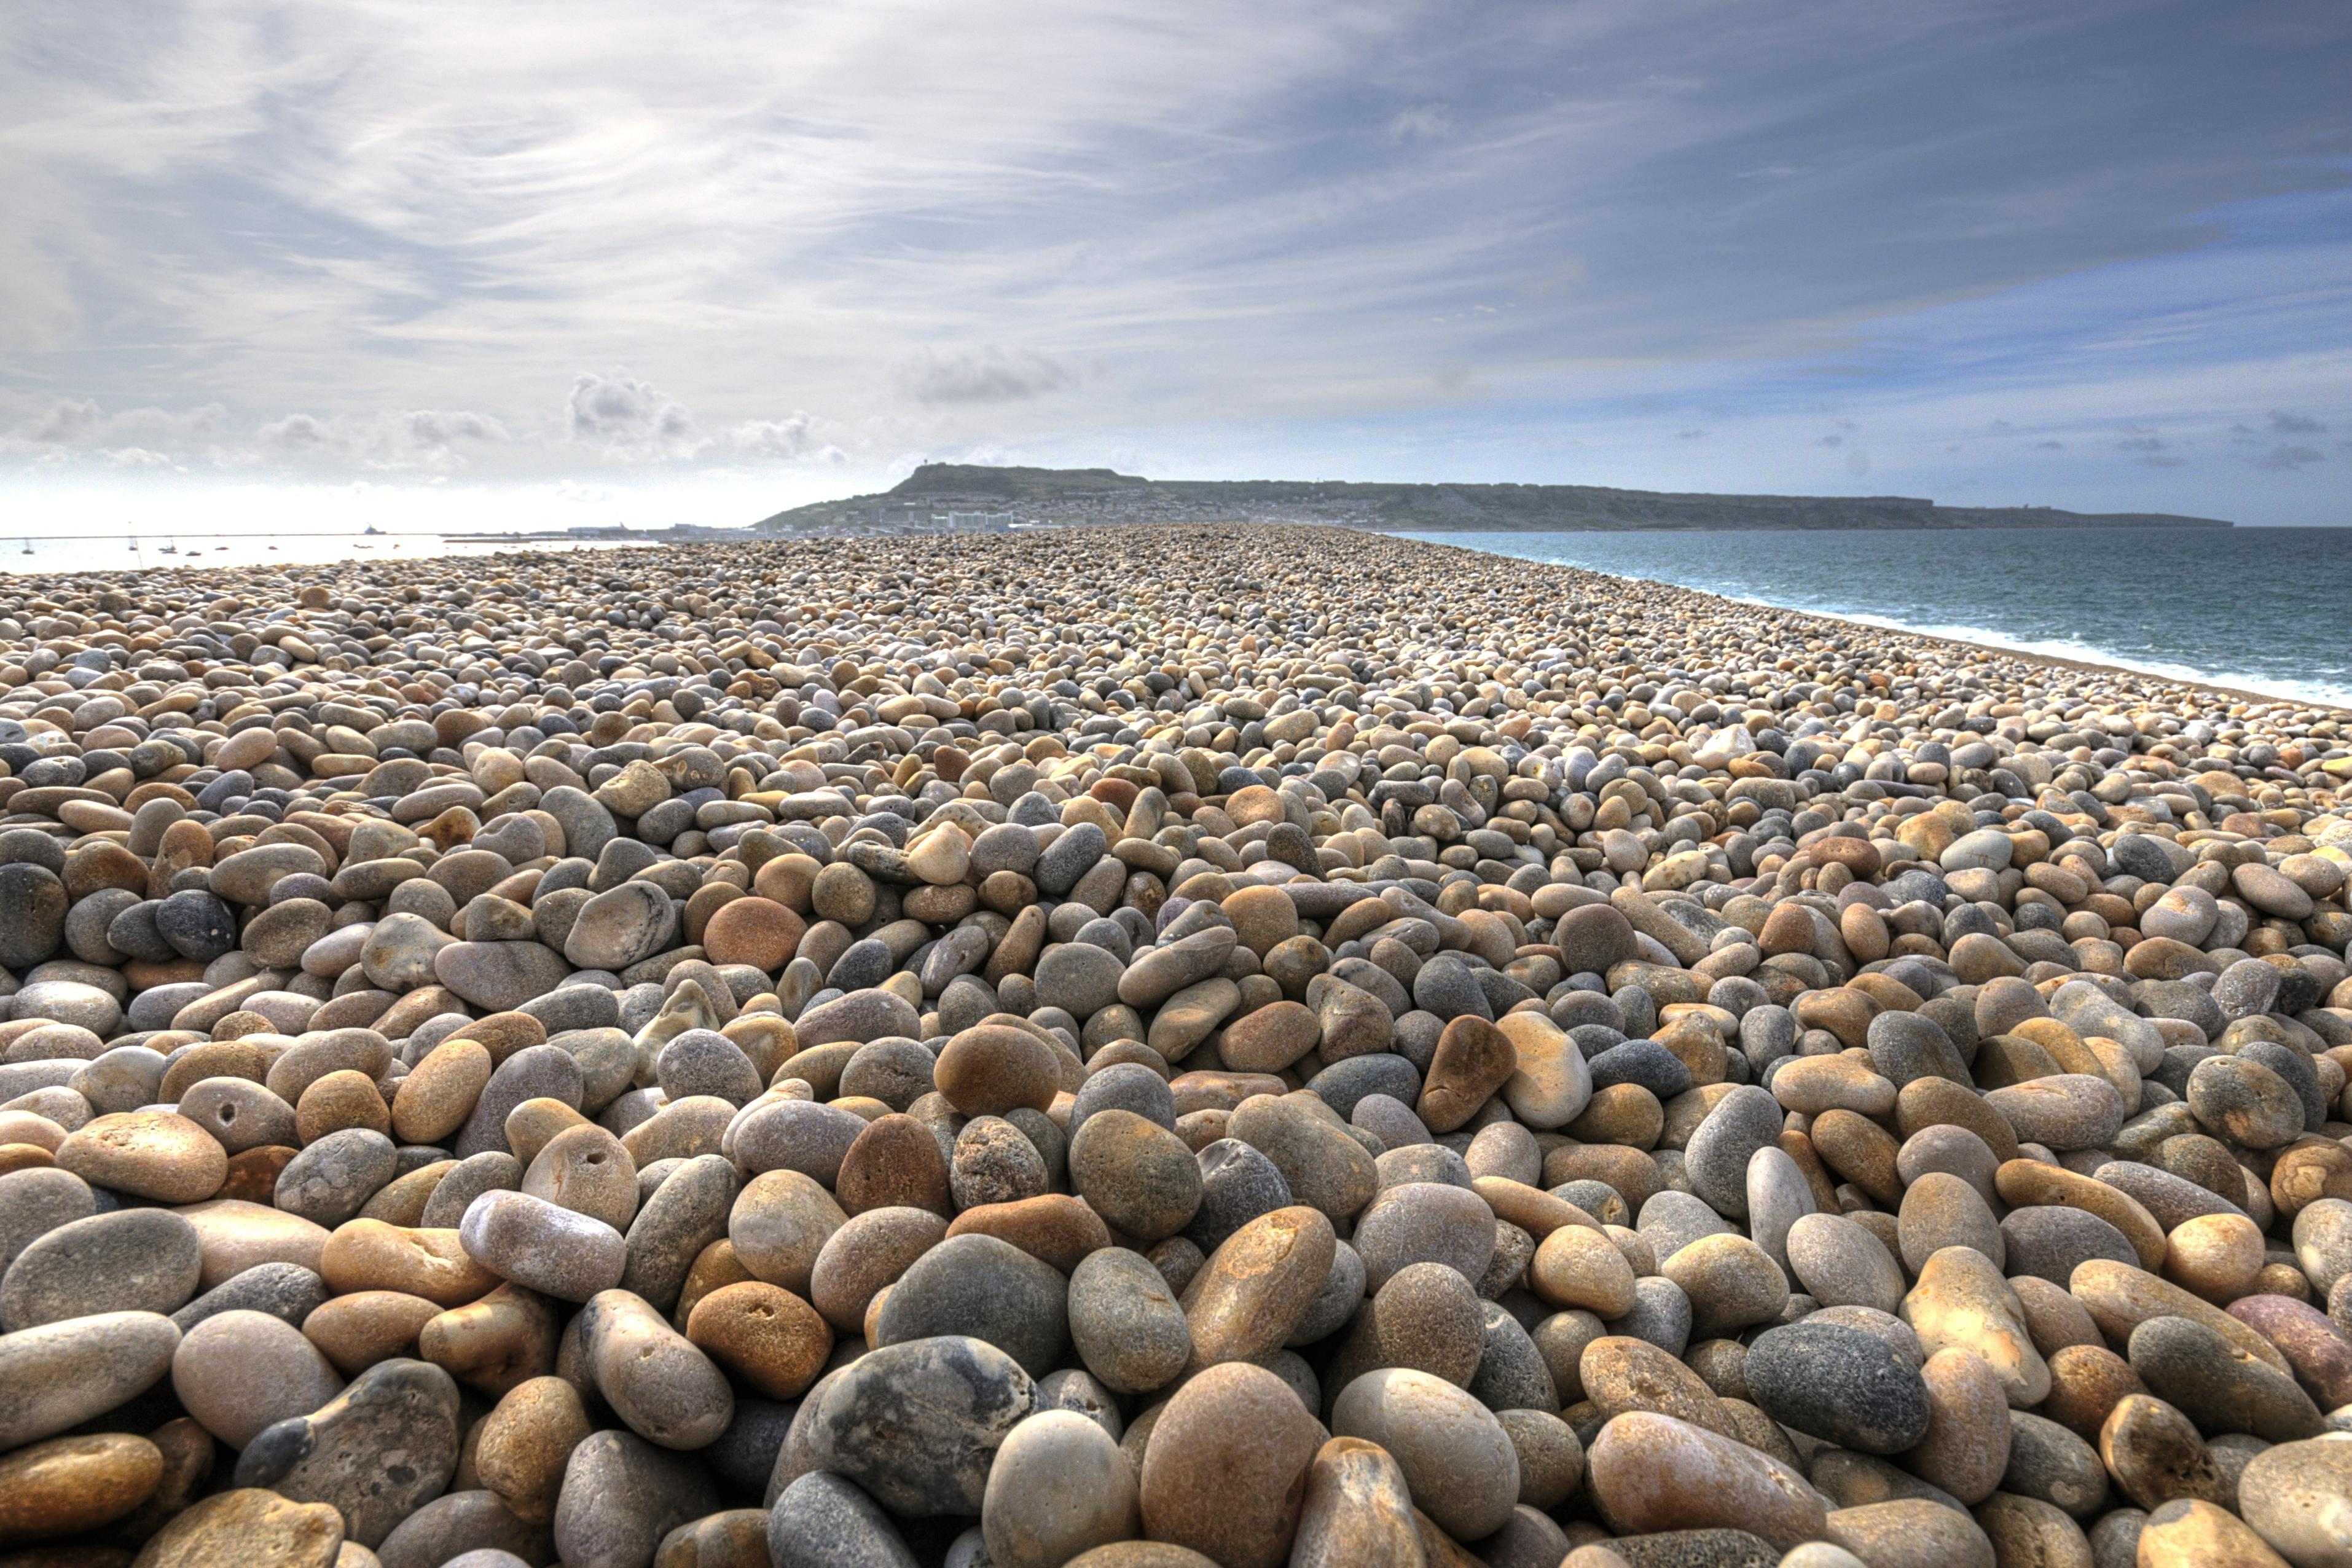 Chesil Beach's pebbles